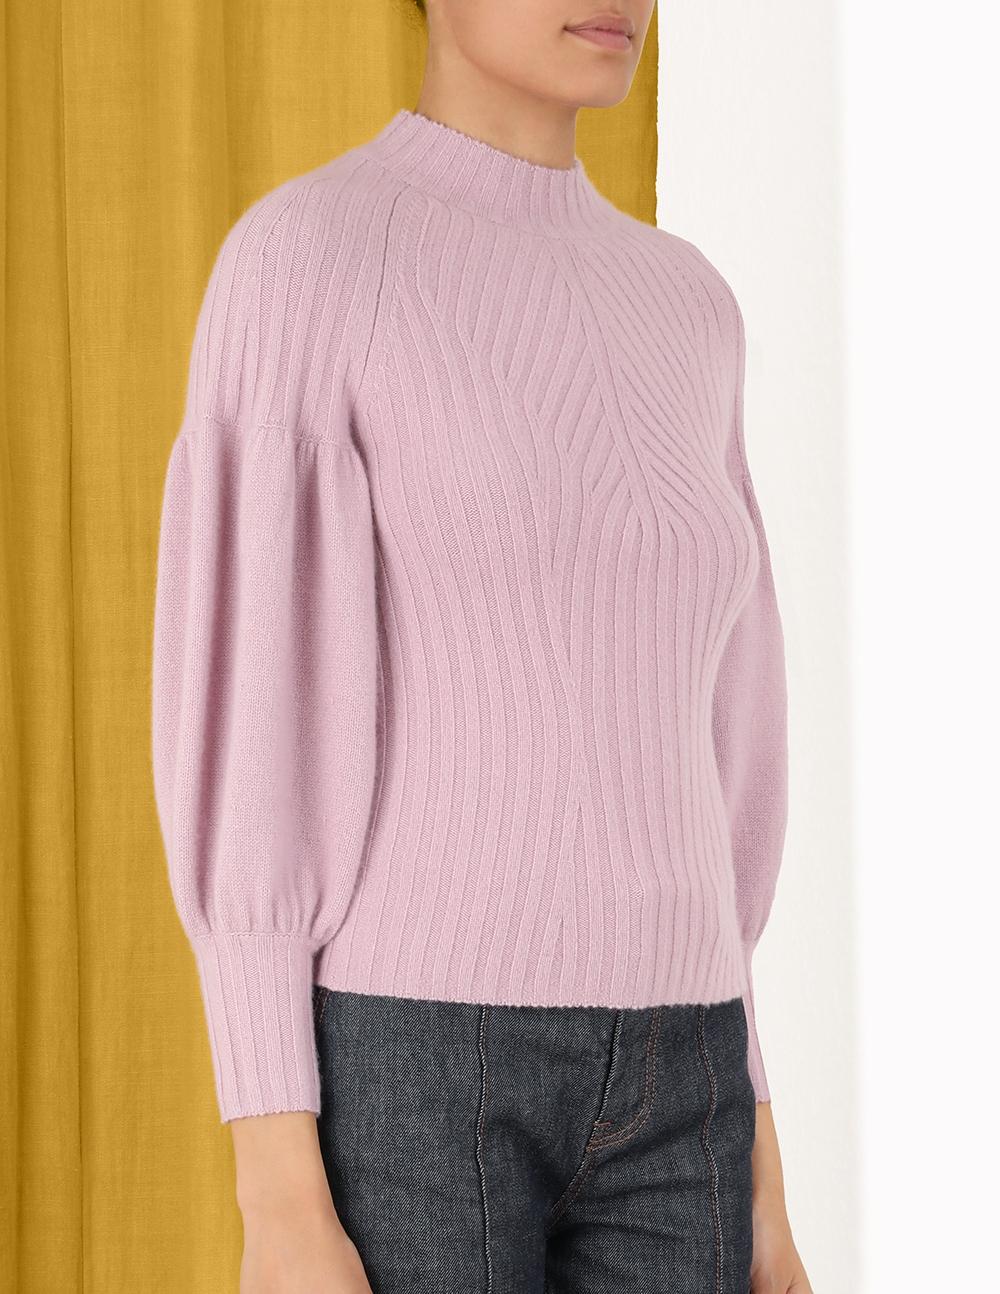 Concert Crew Neck Sweater